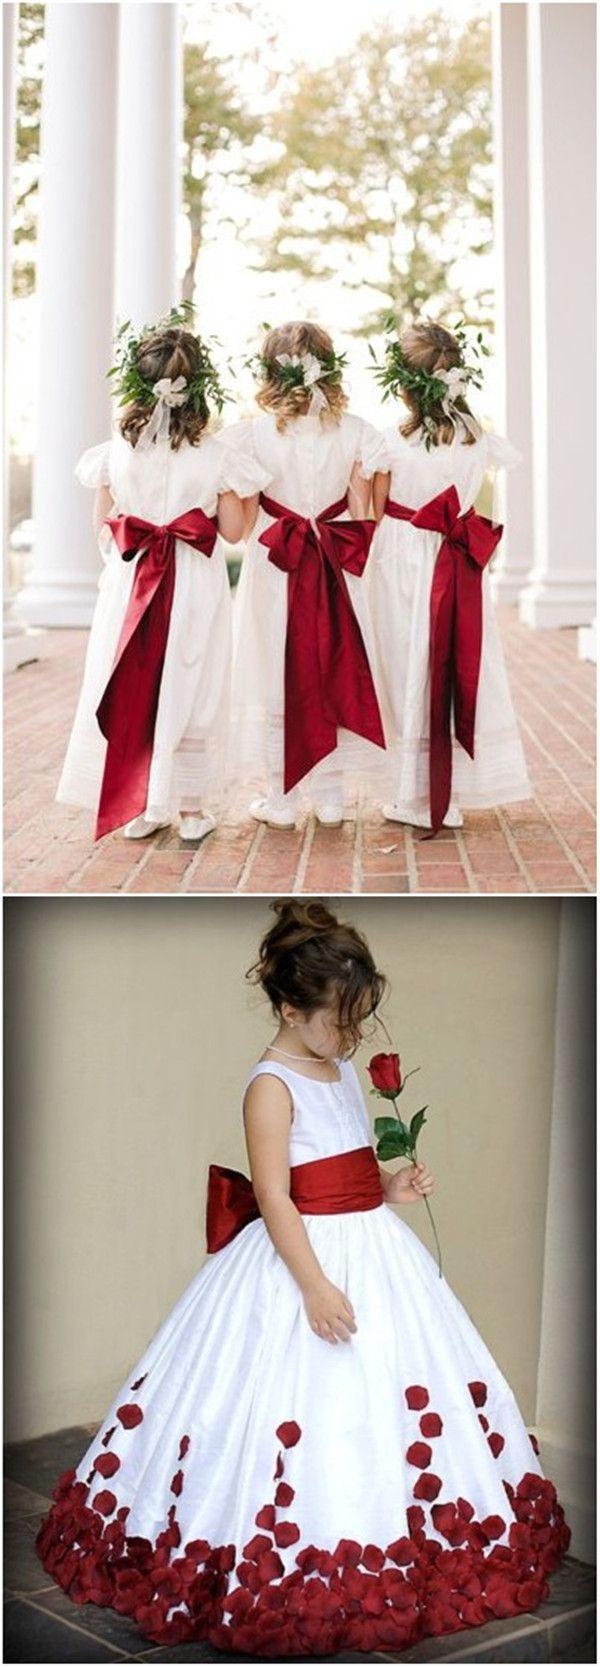 Red and White Flower girl dresses for christmas wedding